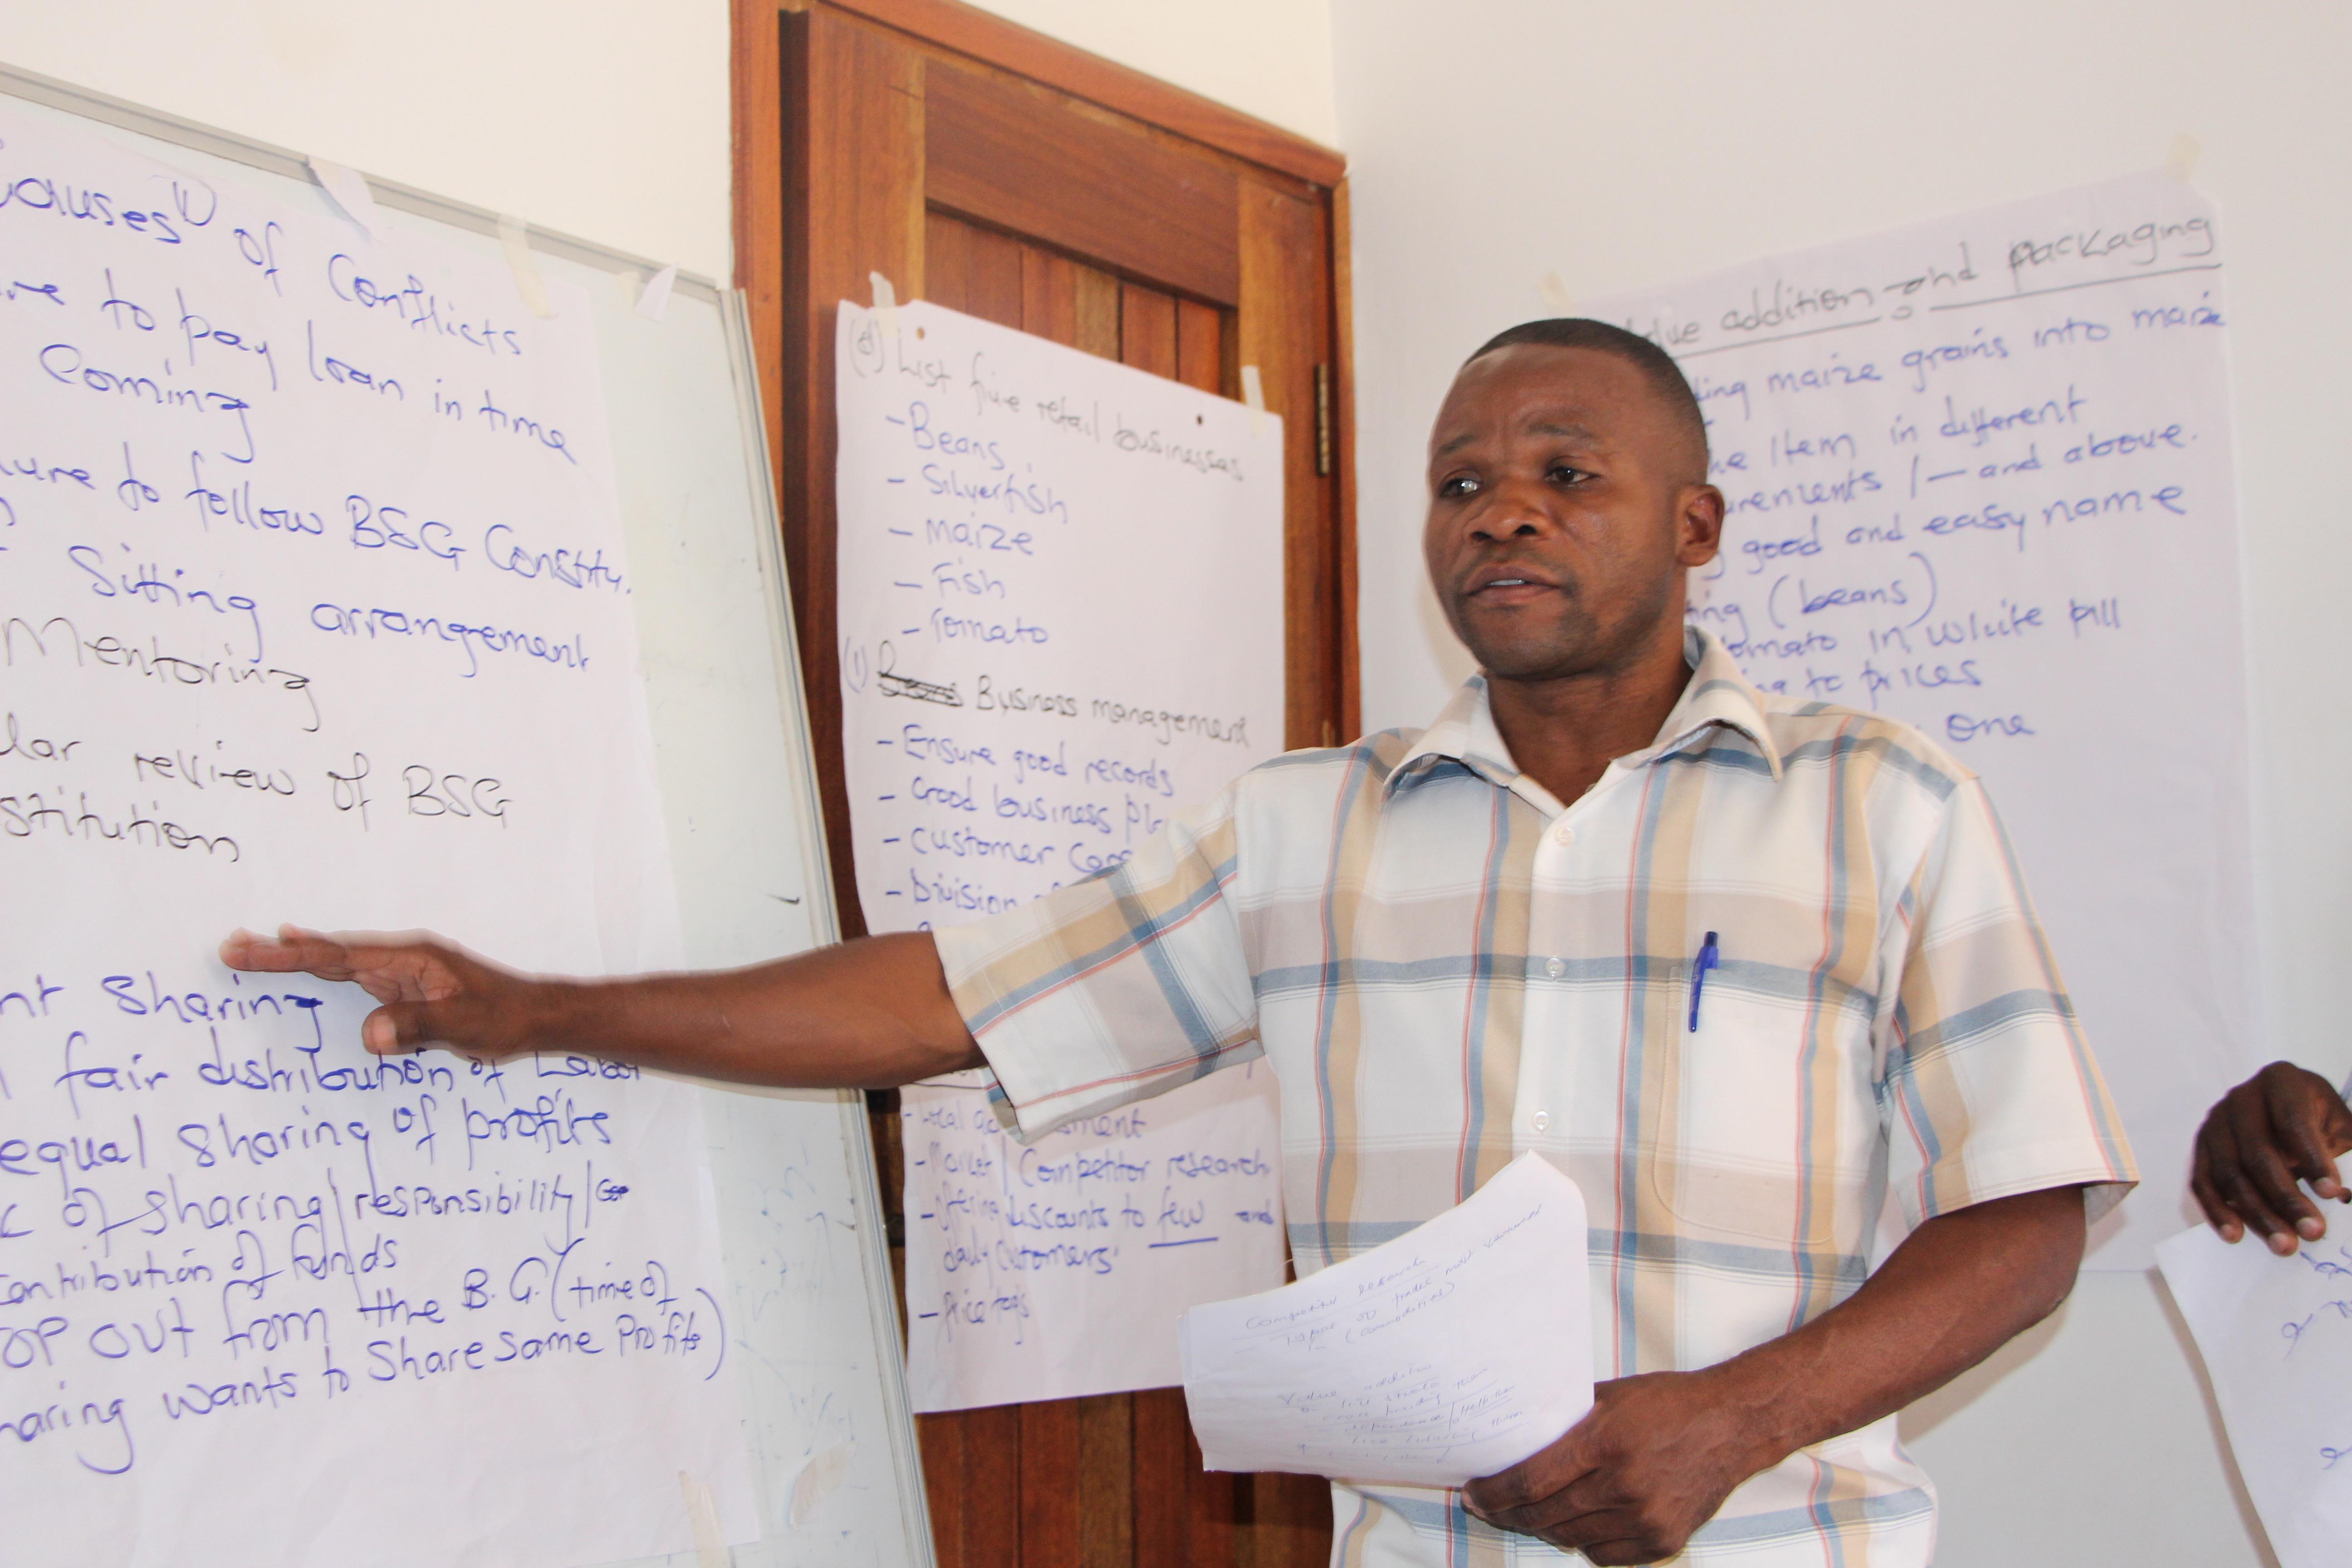 Village Enterprise business mentor Ibrahim shares his best mentoring practices